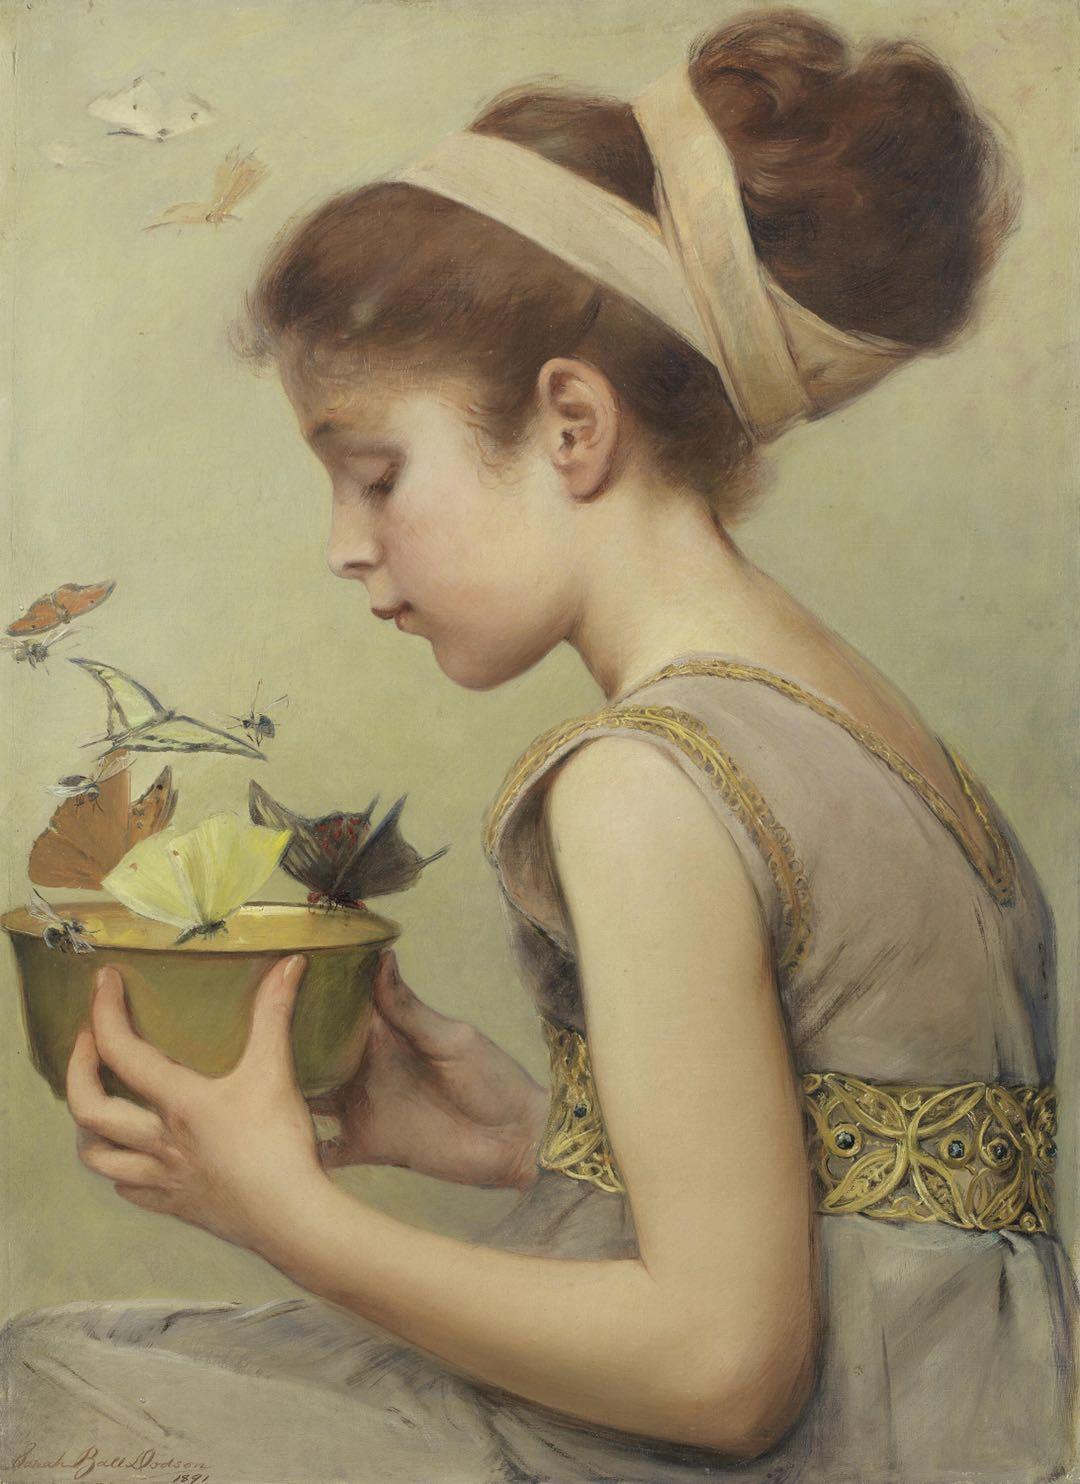 【Dailyart】新艺术细节和《蝴蝶》图案 诠释了一个时代